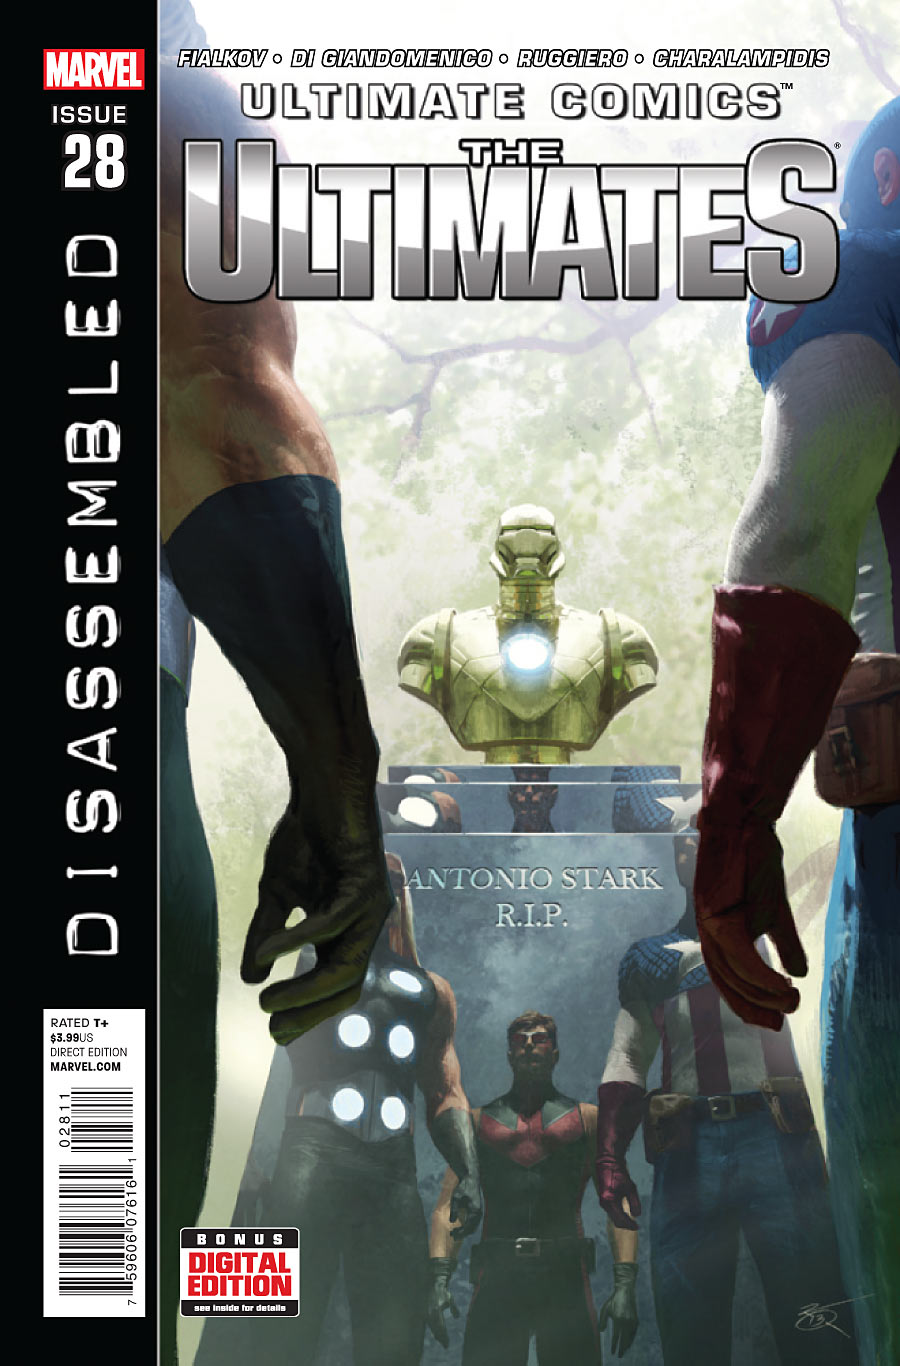 Ultimate Comics: The Ultimates #28